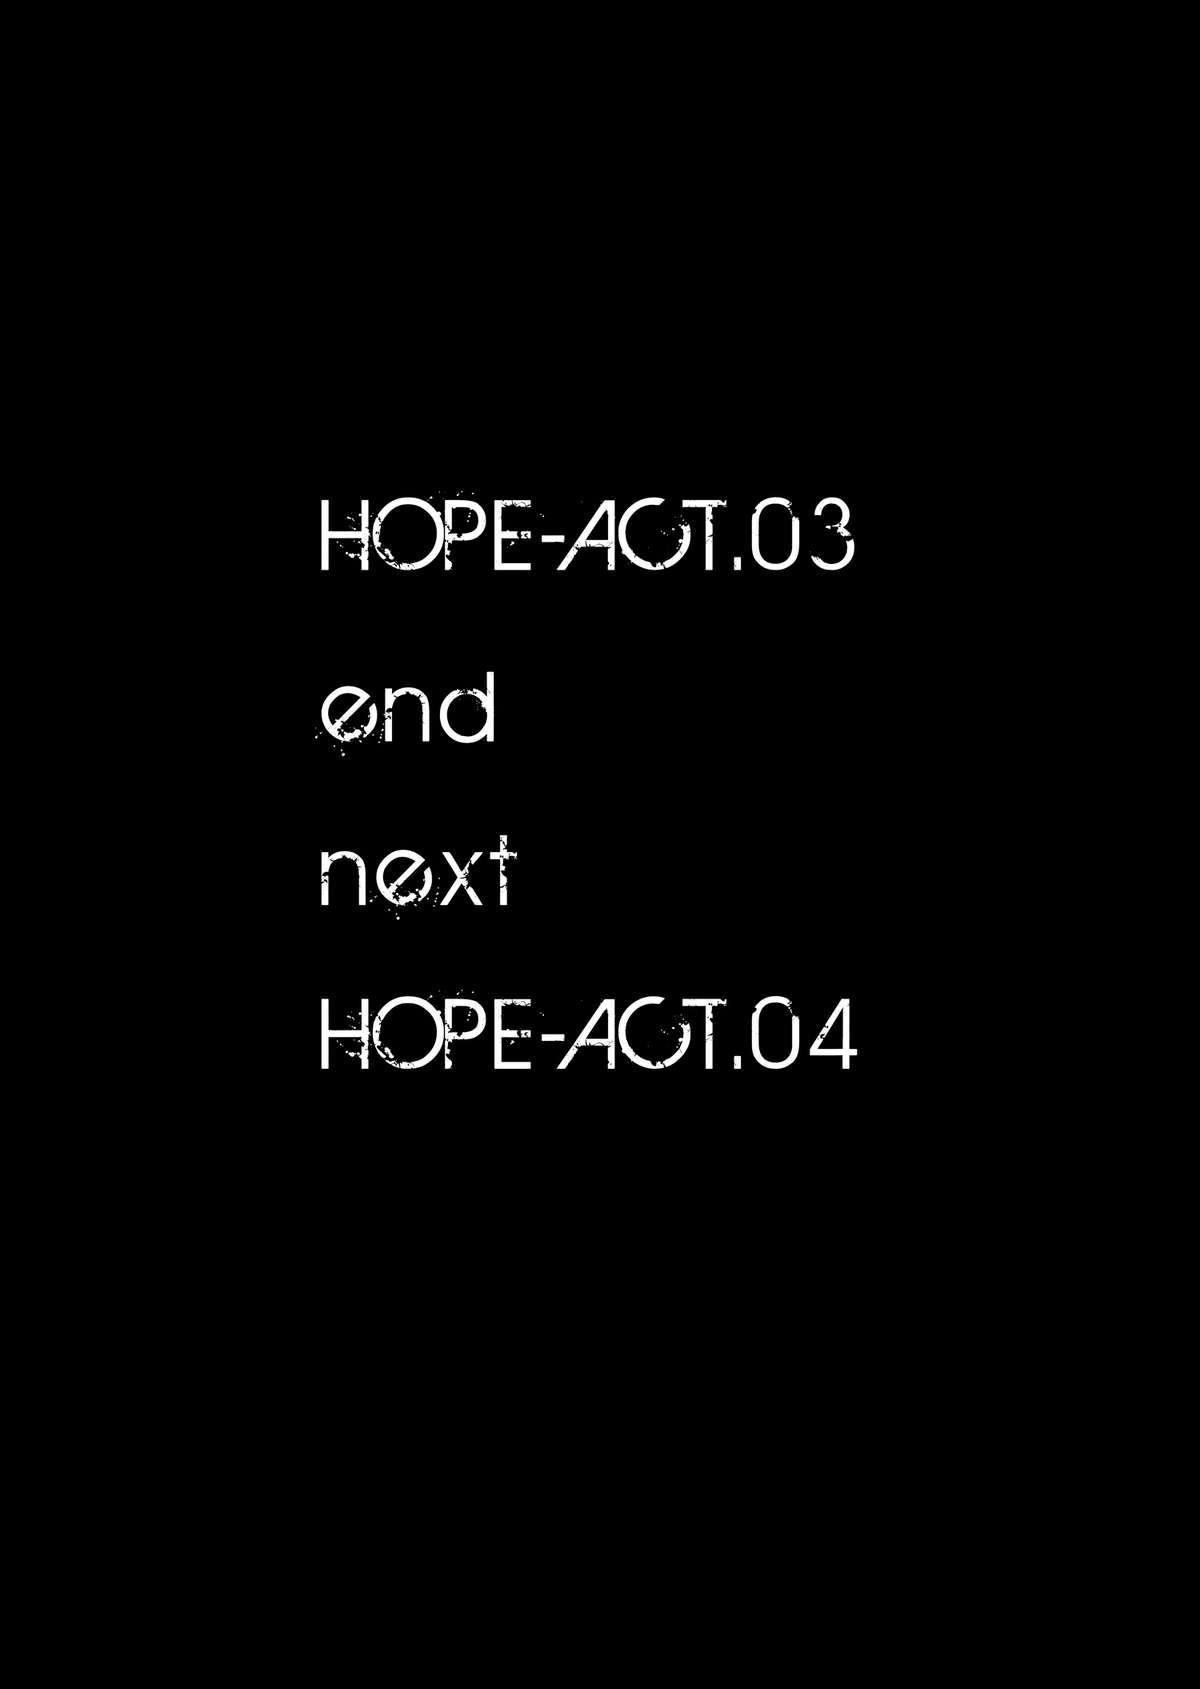 HOPE-ACT.03 31